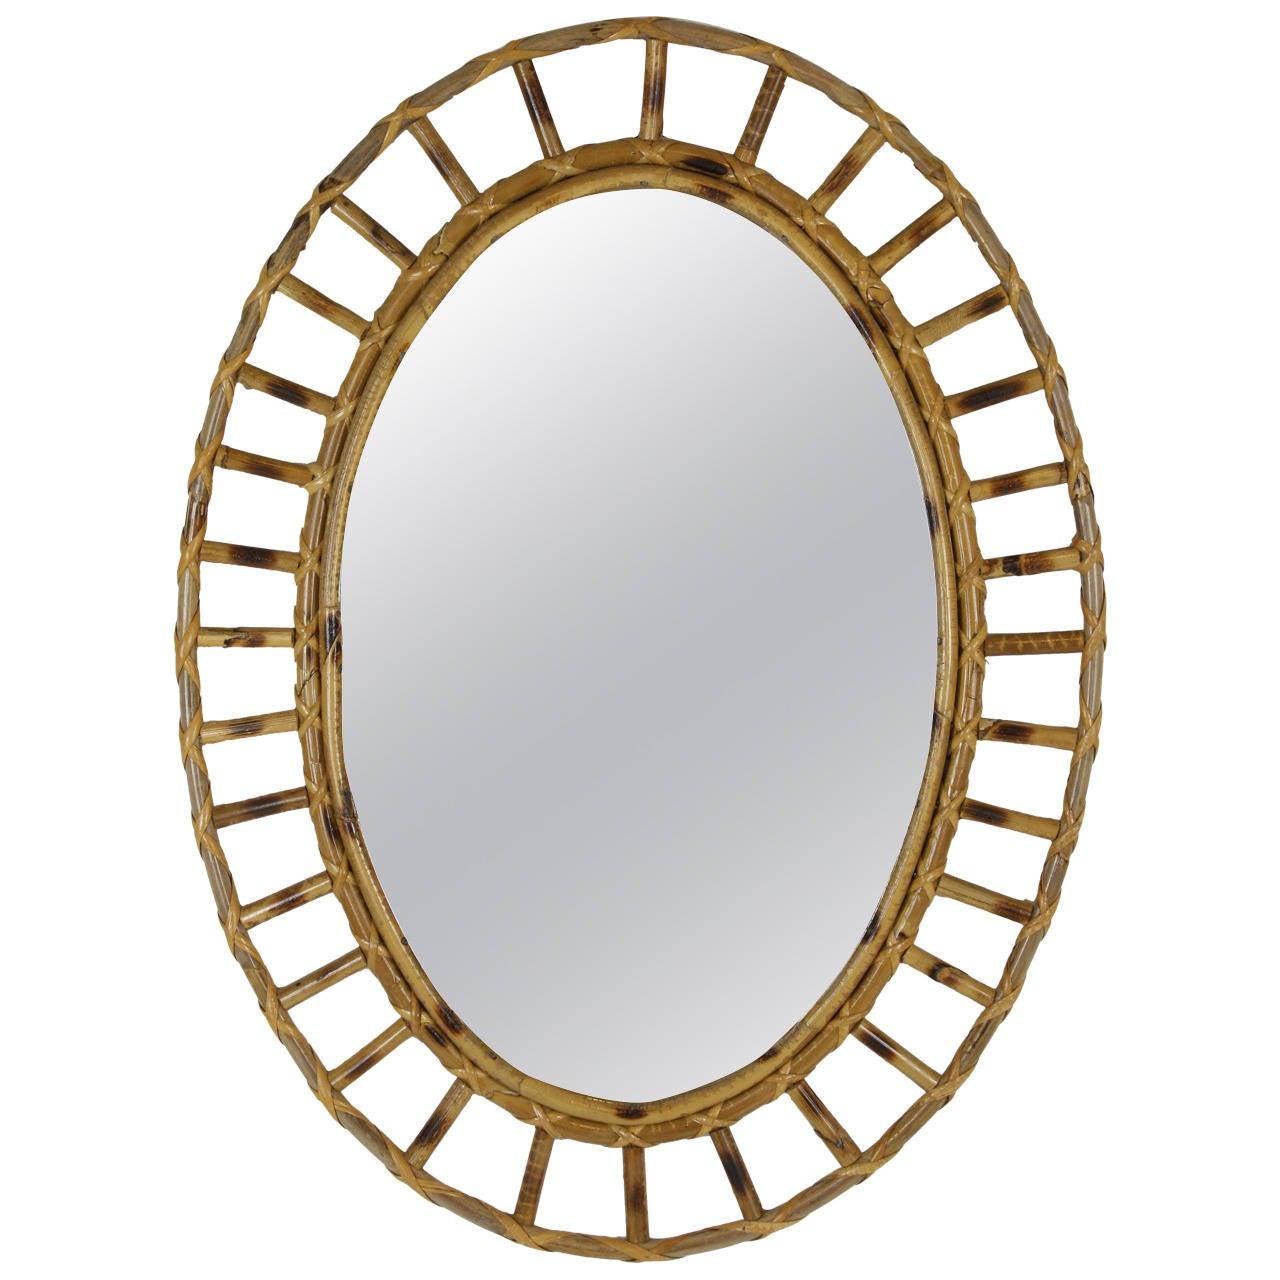 Spanish bamboo oval sunburst mirror for sale at 1stdibs for Sunburst mirror